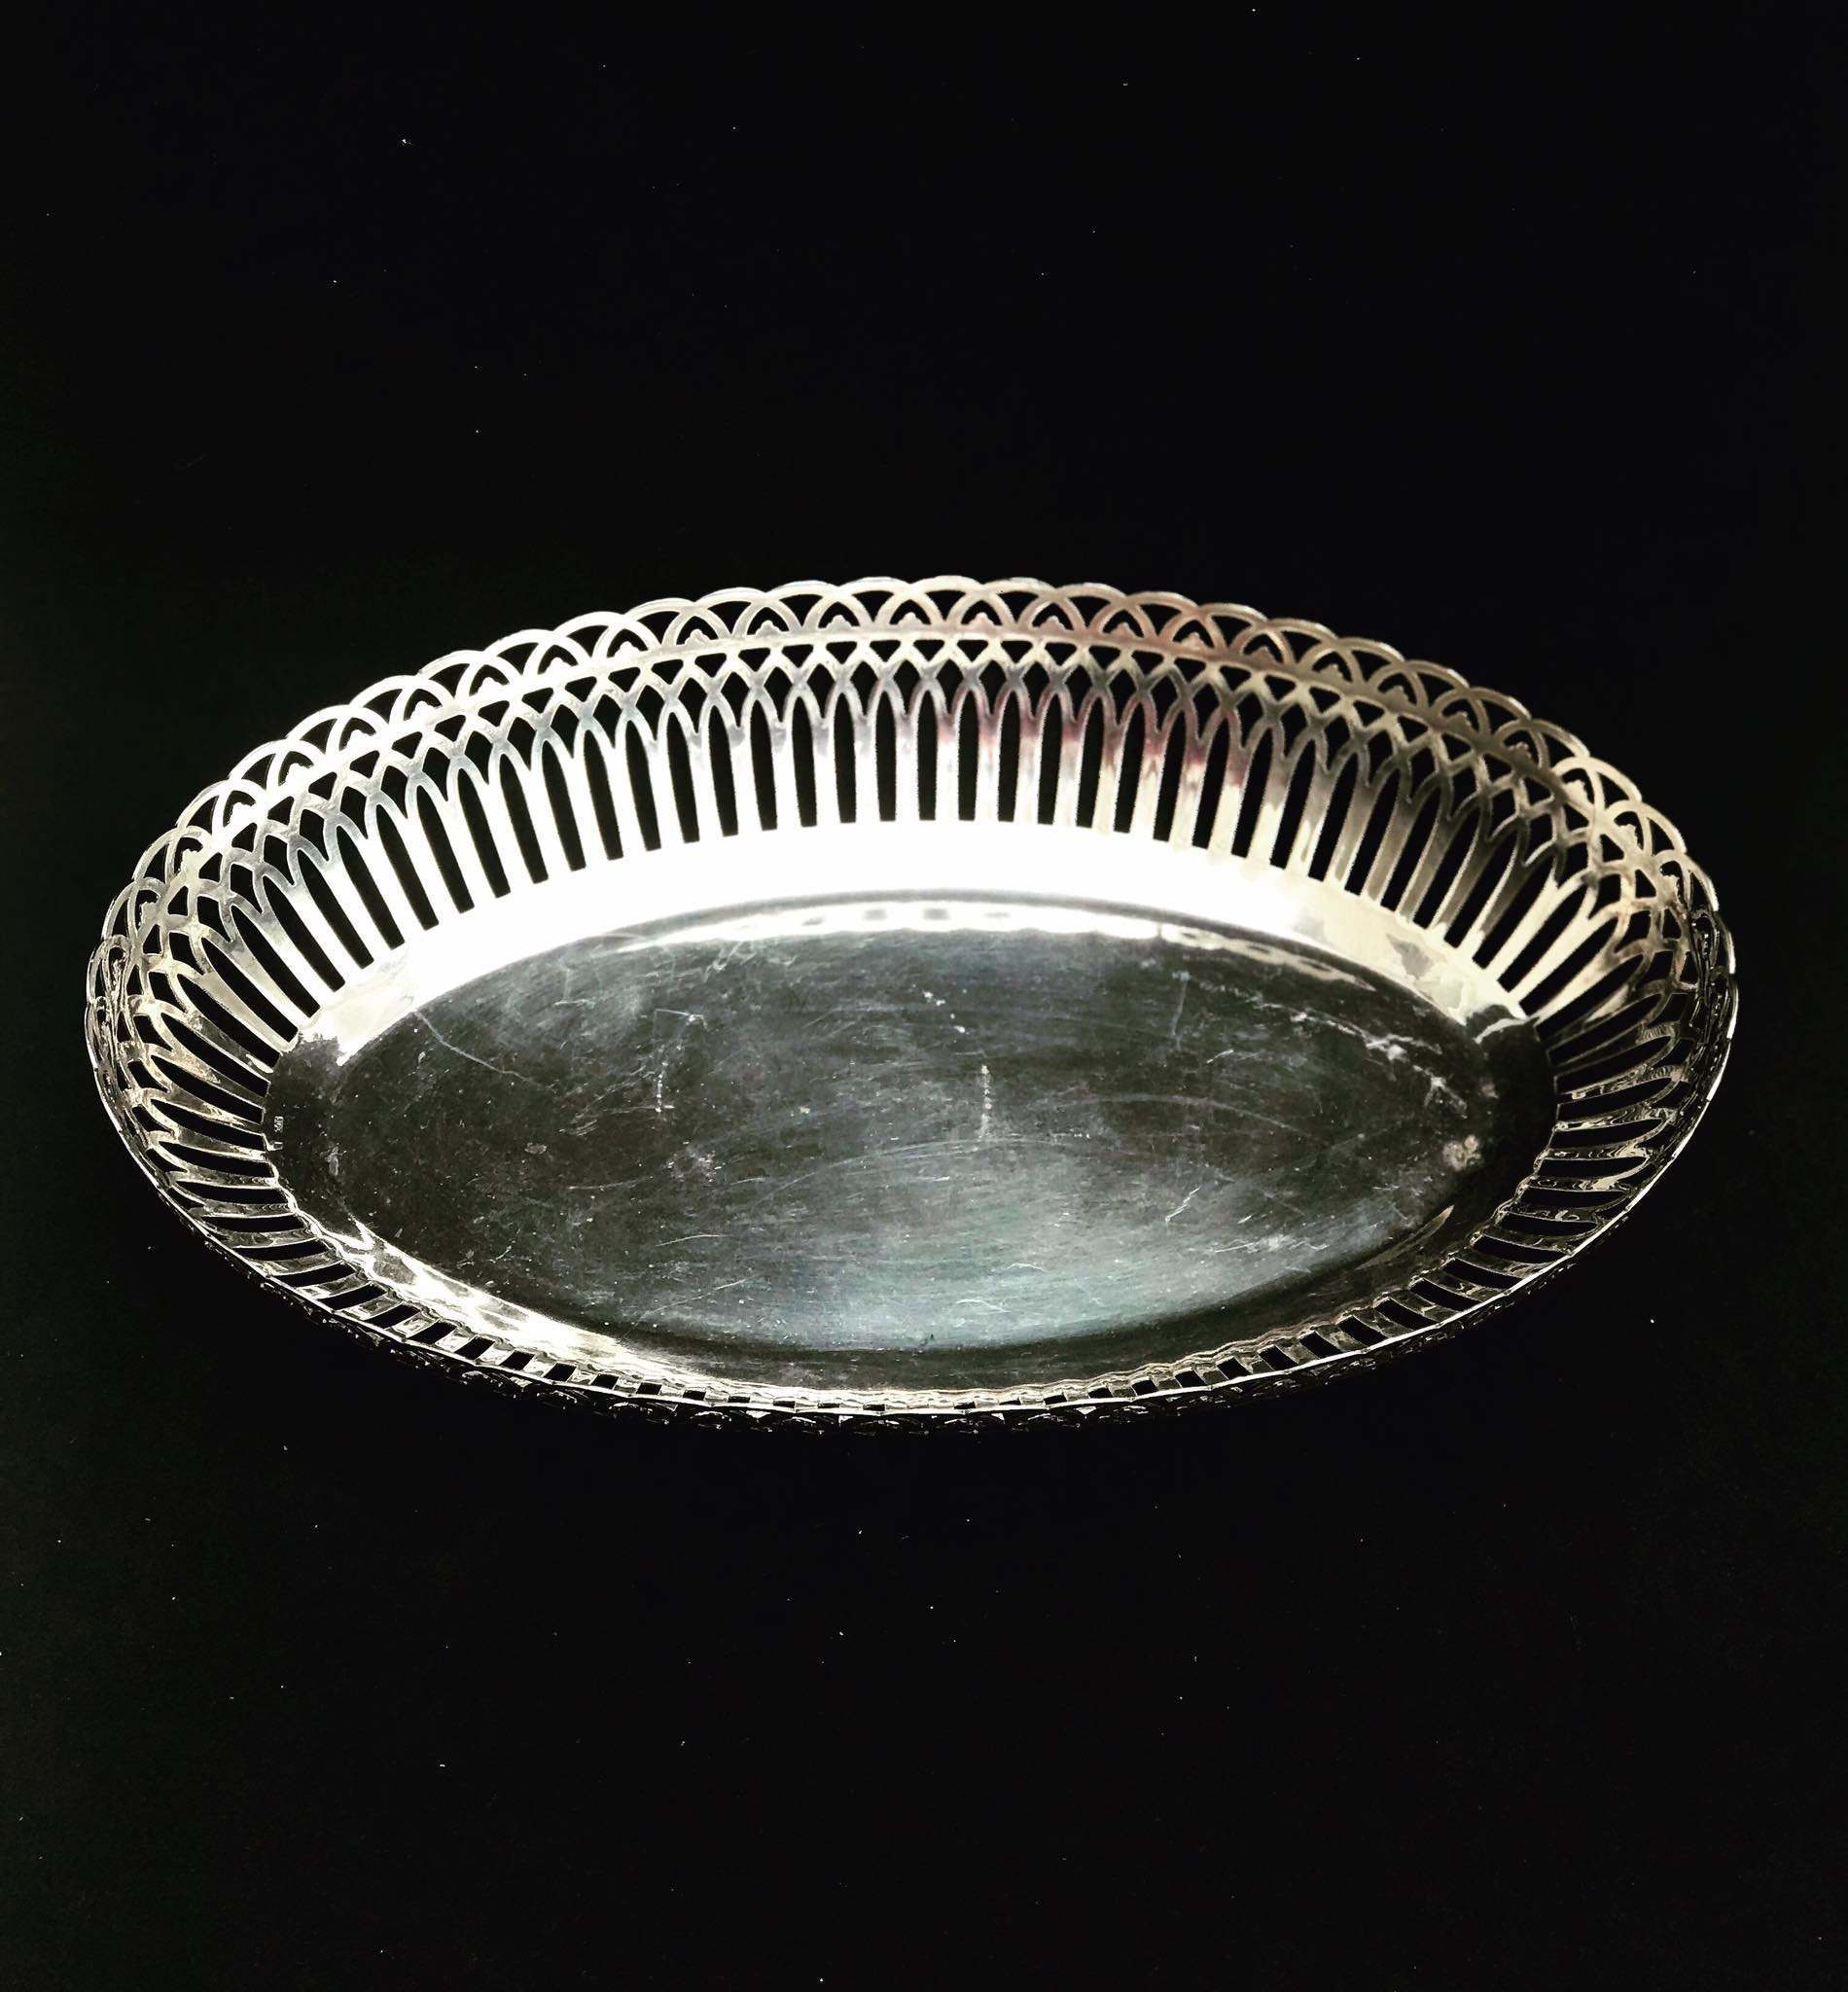 Bread Basket Serving Tray Fruits Serving Plate Silver Plated Antique Vintage Table Gift For Her Wedding Gift J G Brown Vinterior